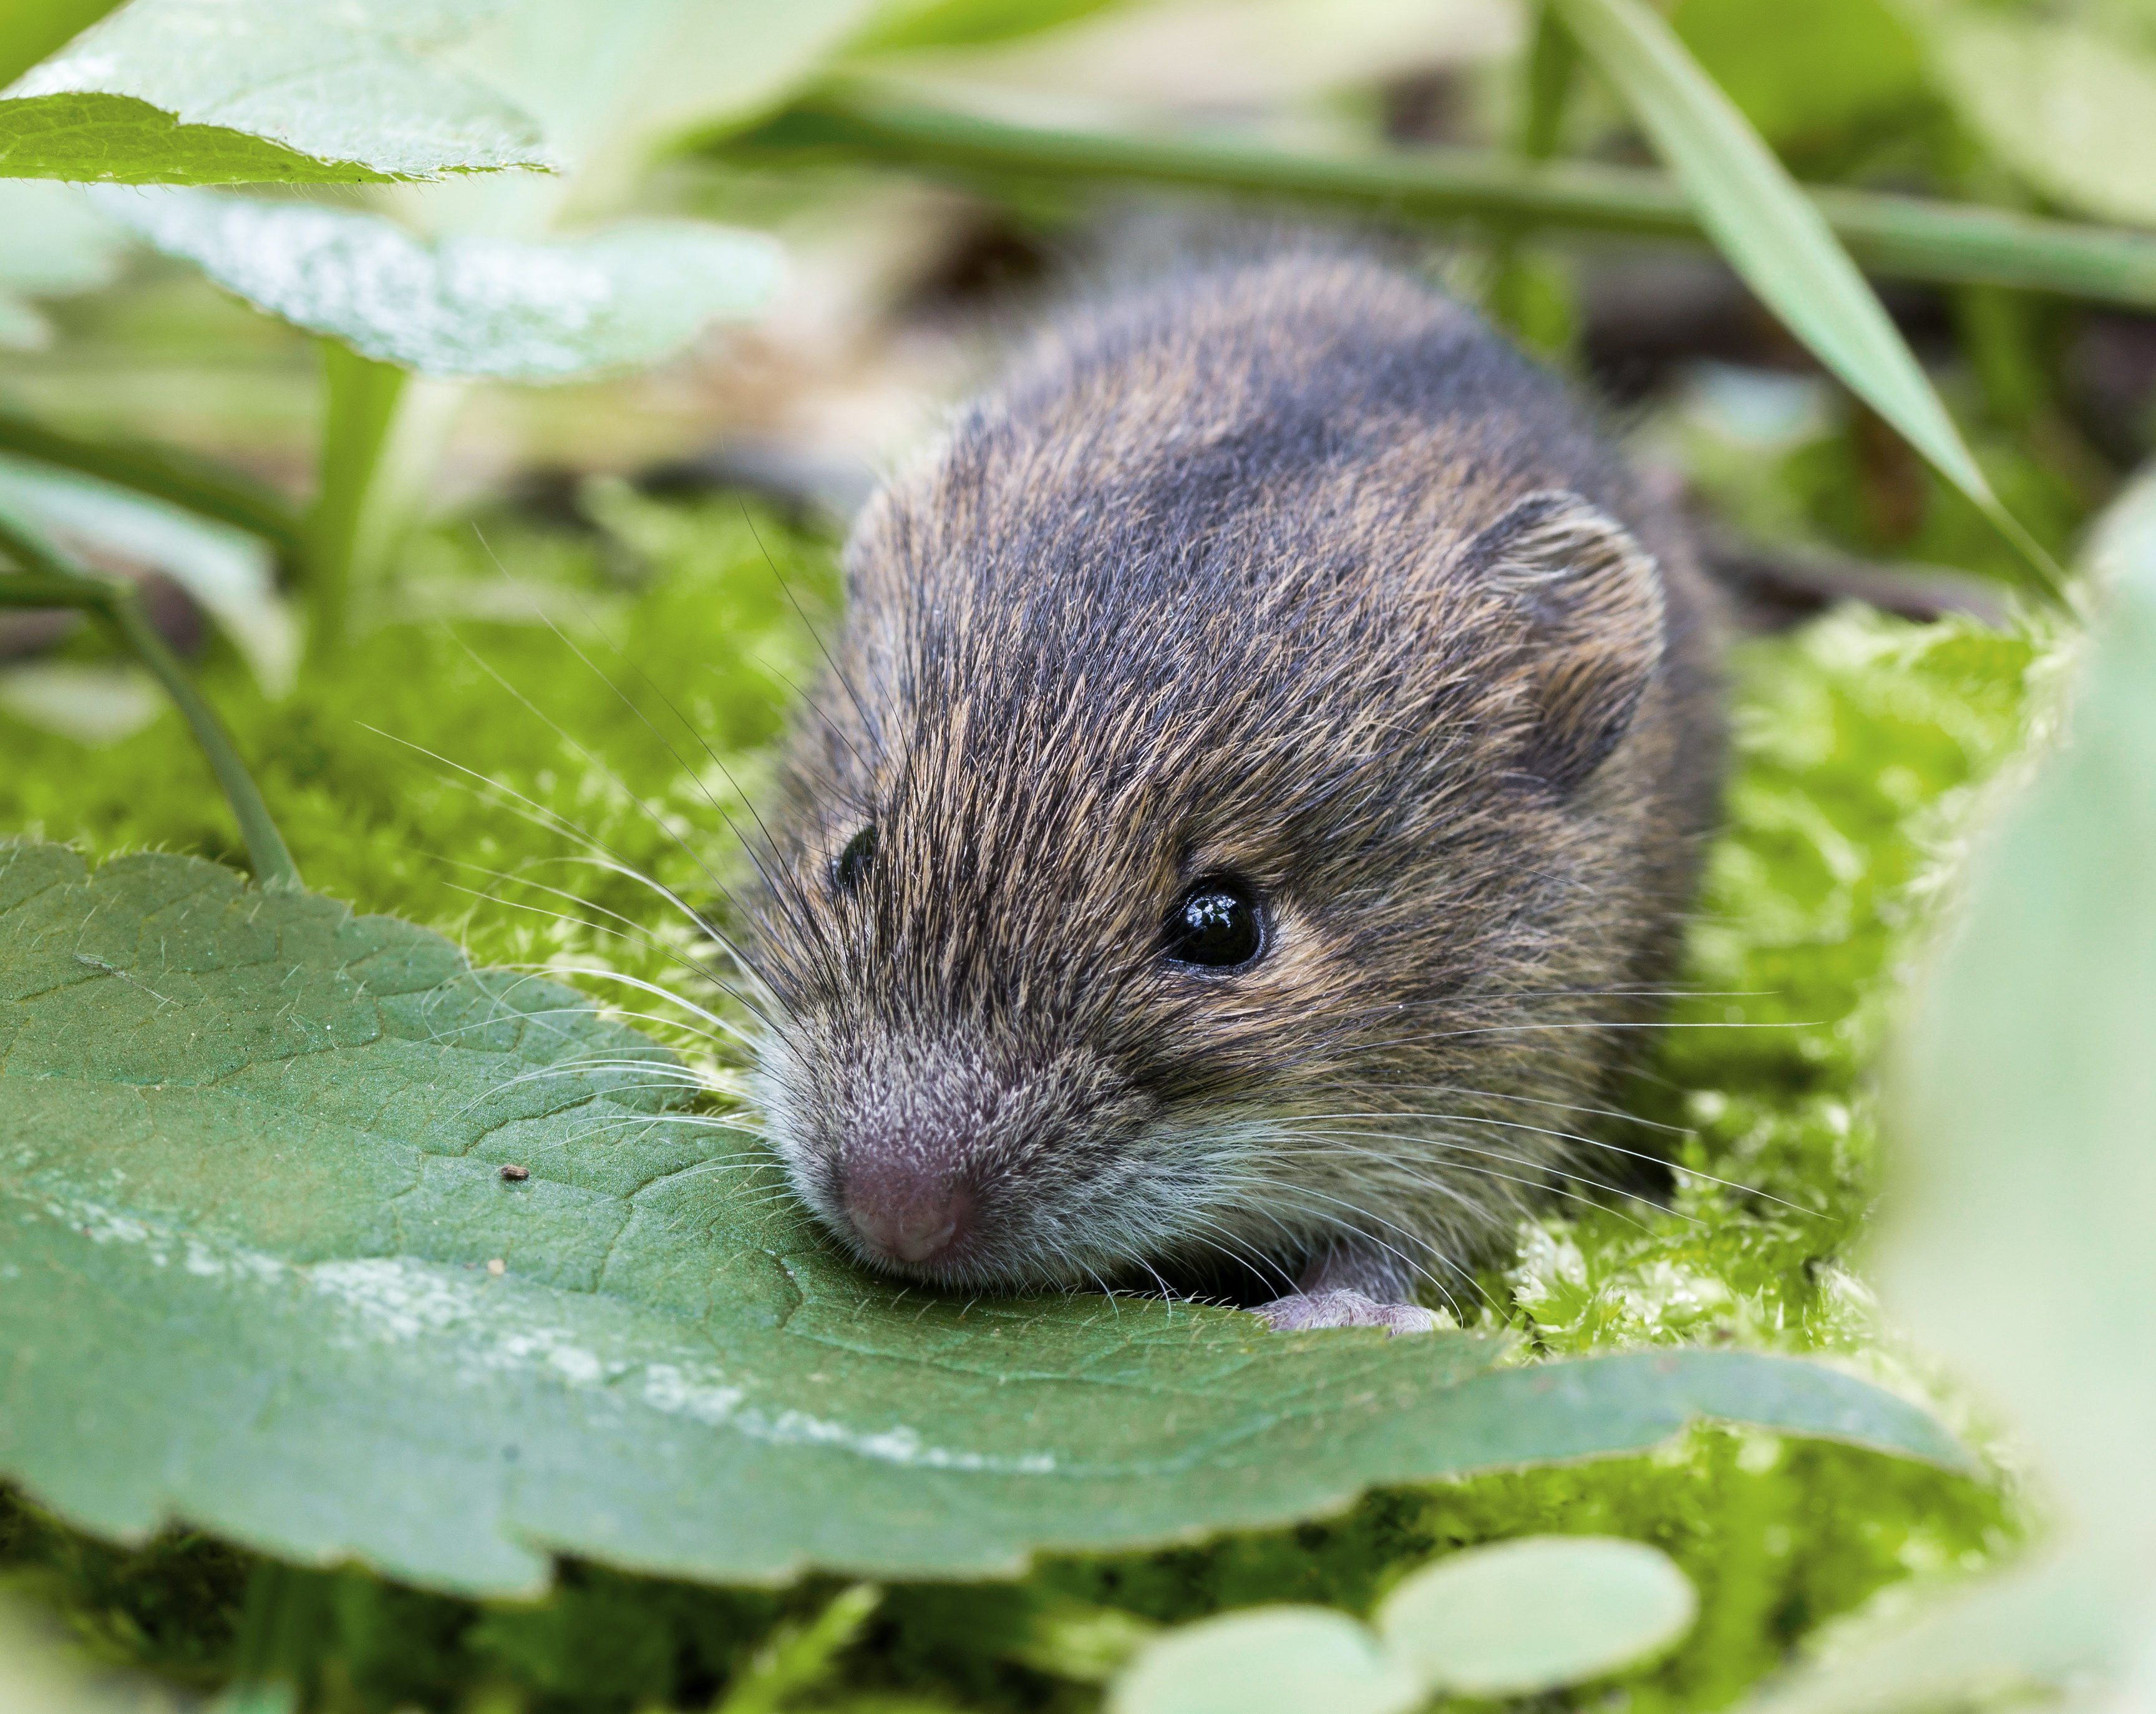 forest birch mouse (Sicista betulina) small in its natural habitat.; Shutterstock ID 650589304; Job (TFH, TOH, RD, BNB, CWM, CM): -